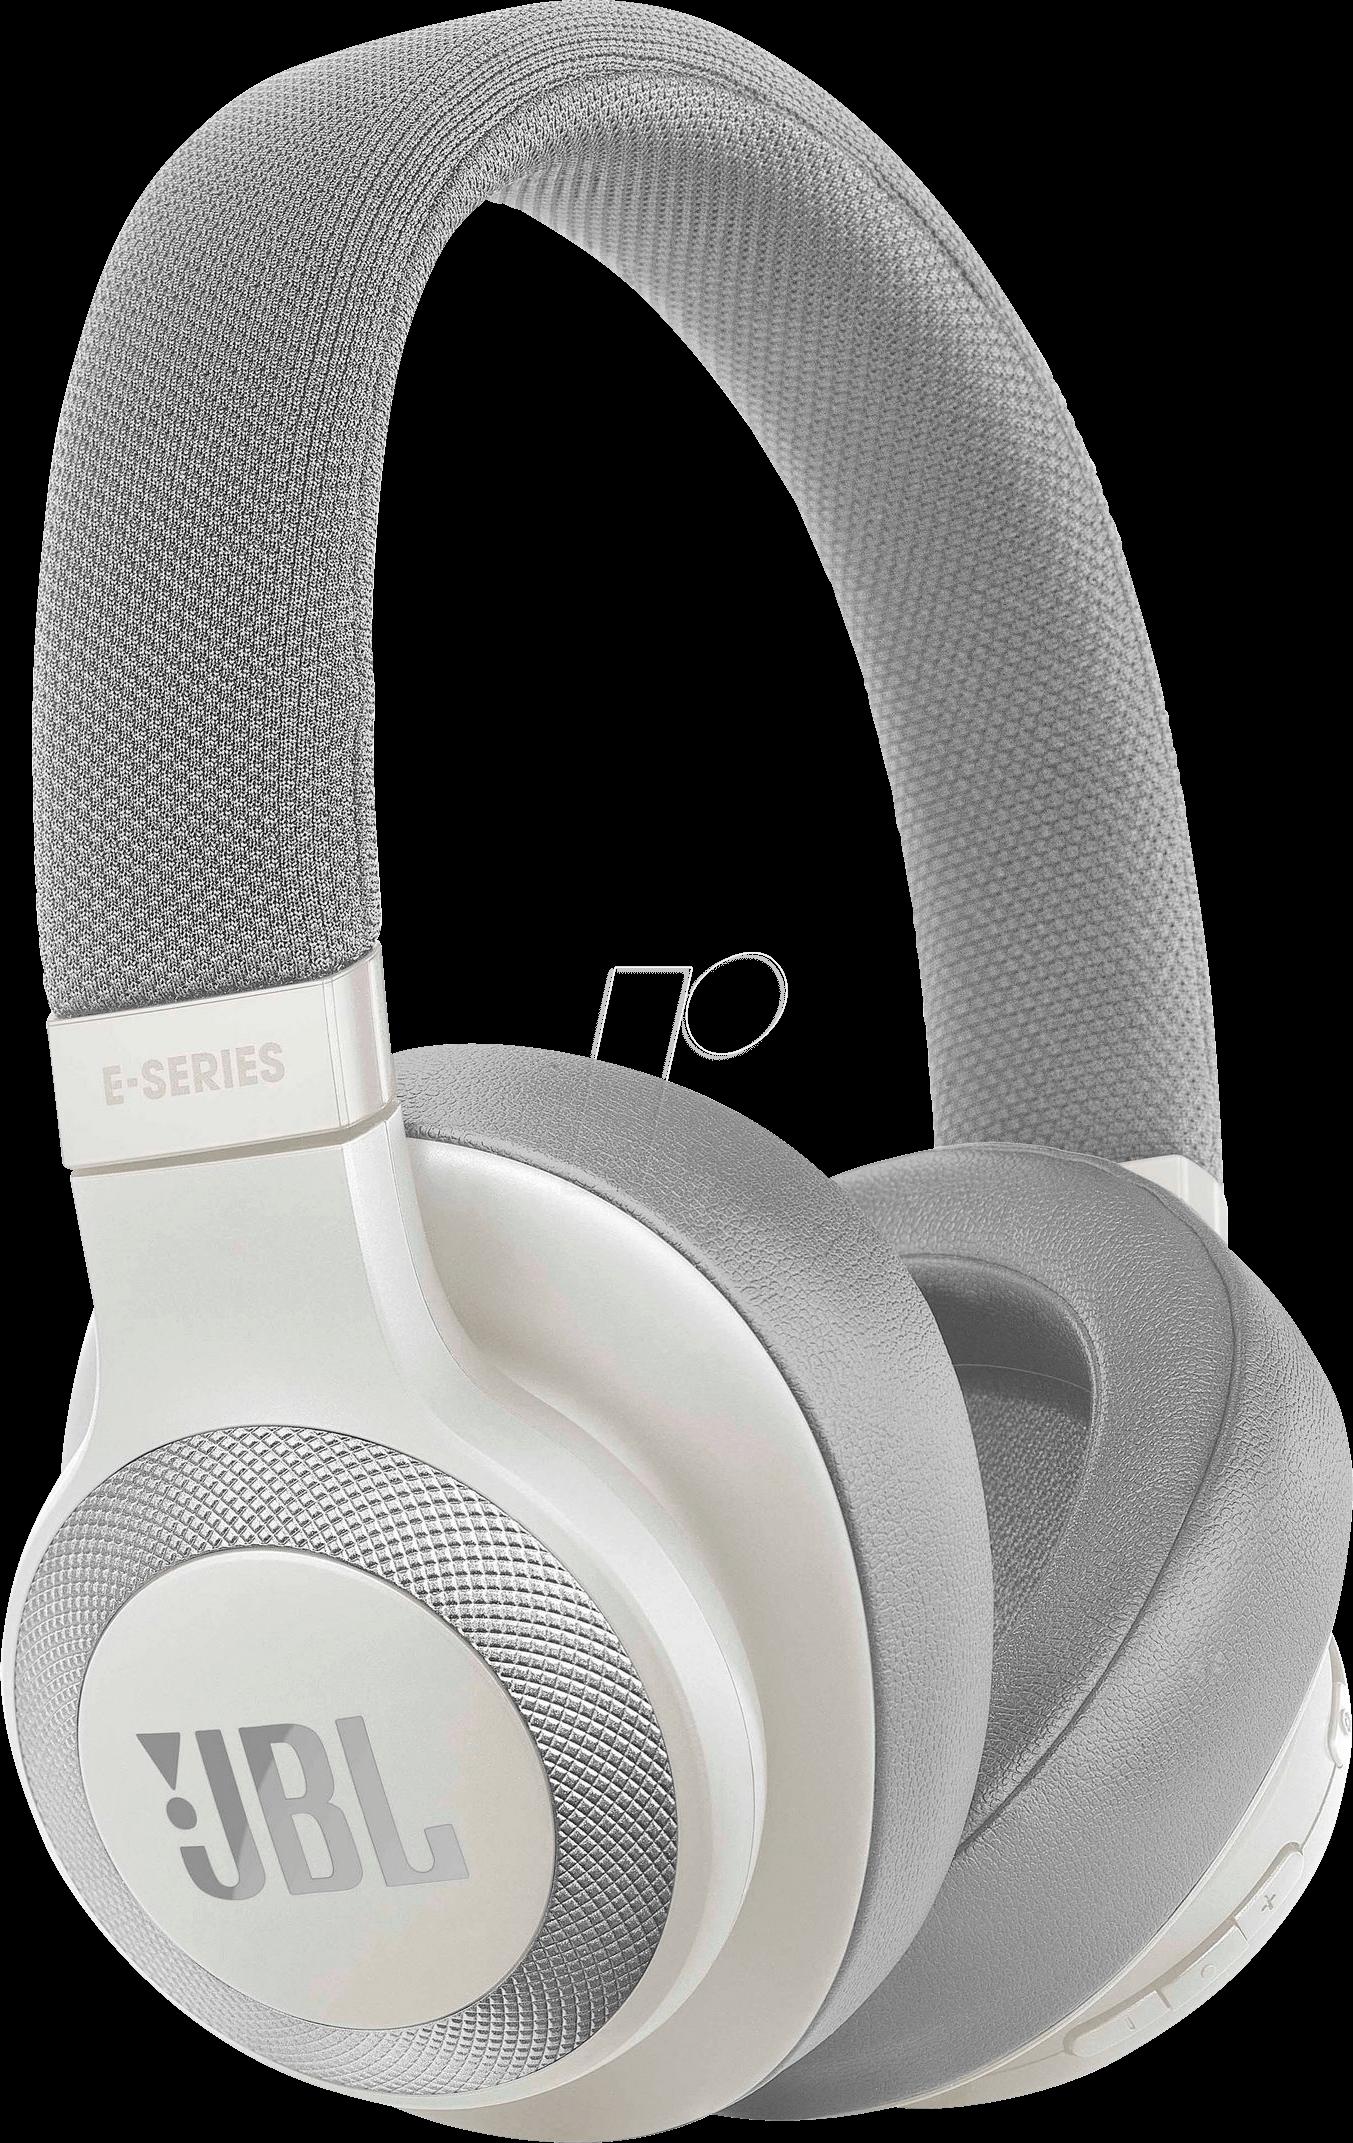 47556f0fd7d Bluetooth® over-ear noise cancelling headphones, white JBL JBLE65BTNCWHT